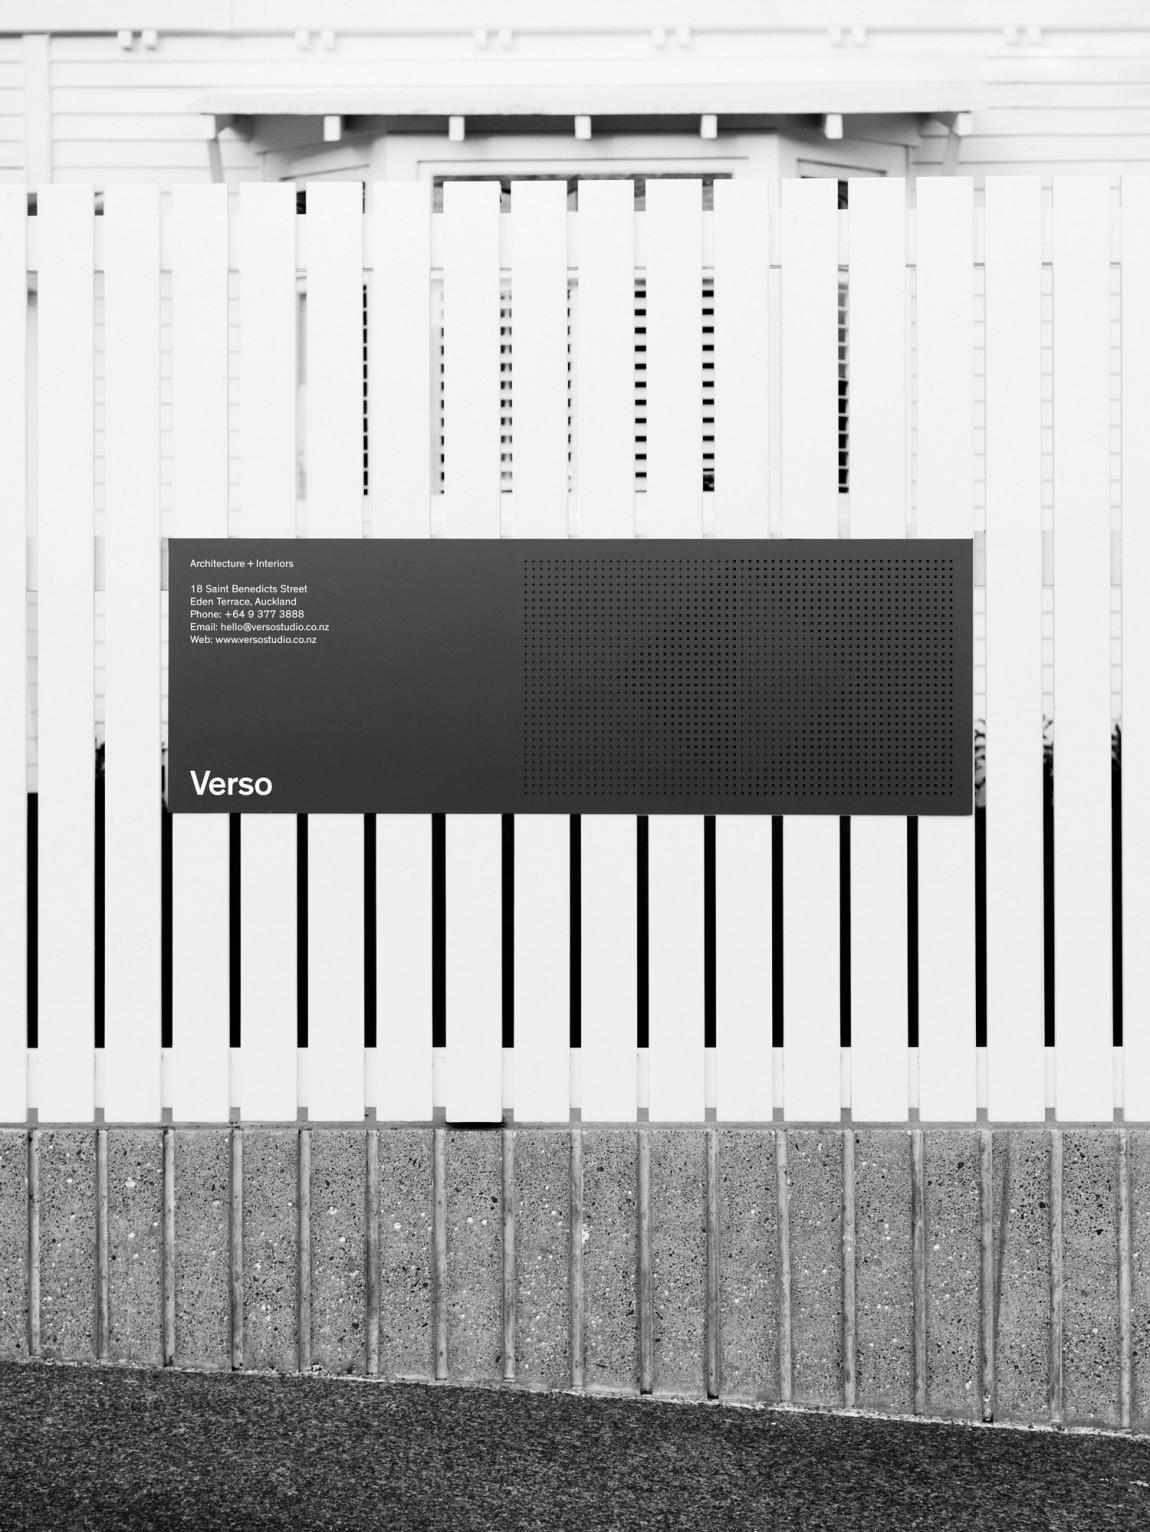 Verso建筑空间设计公司企业形象VI设计, 标识标牌设计